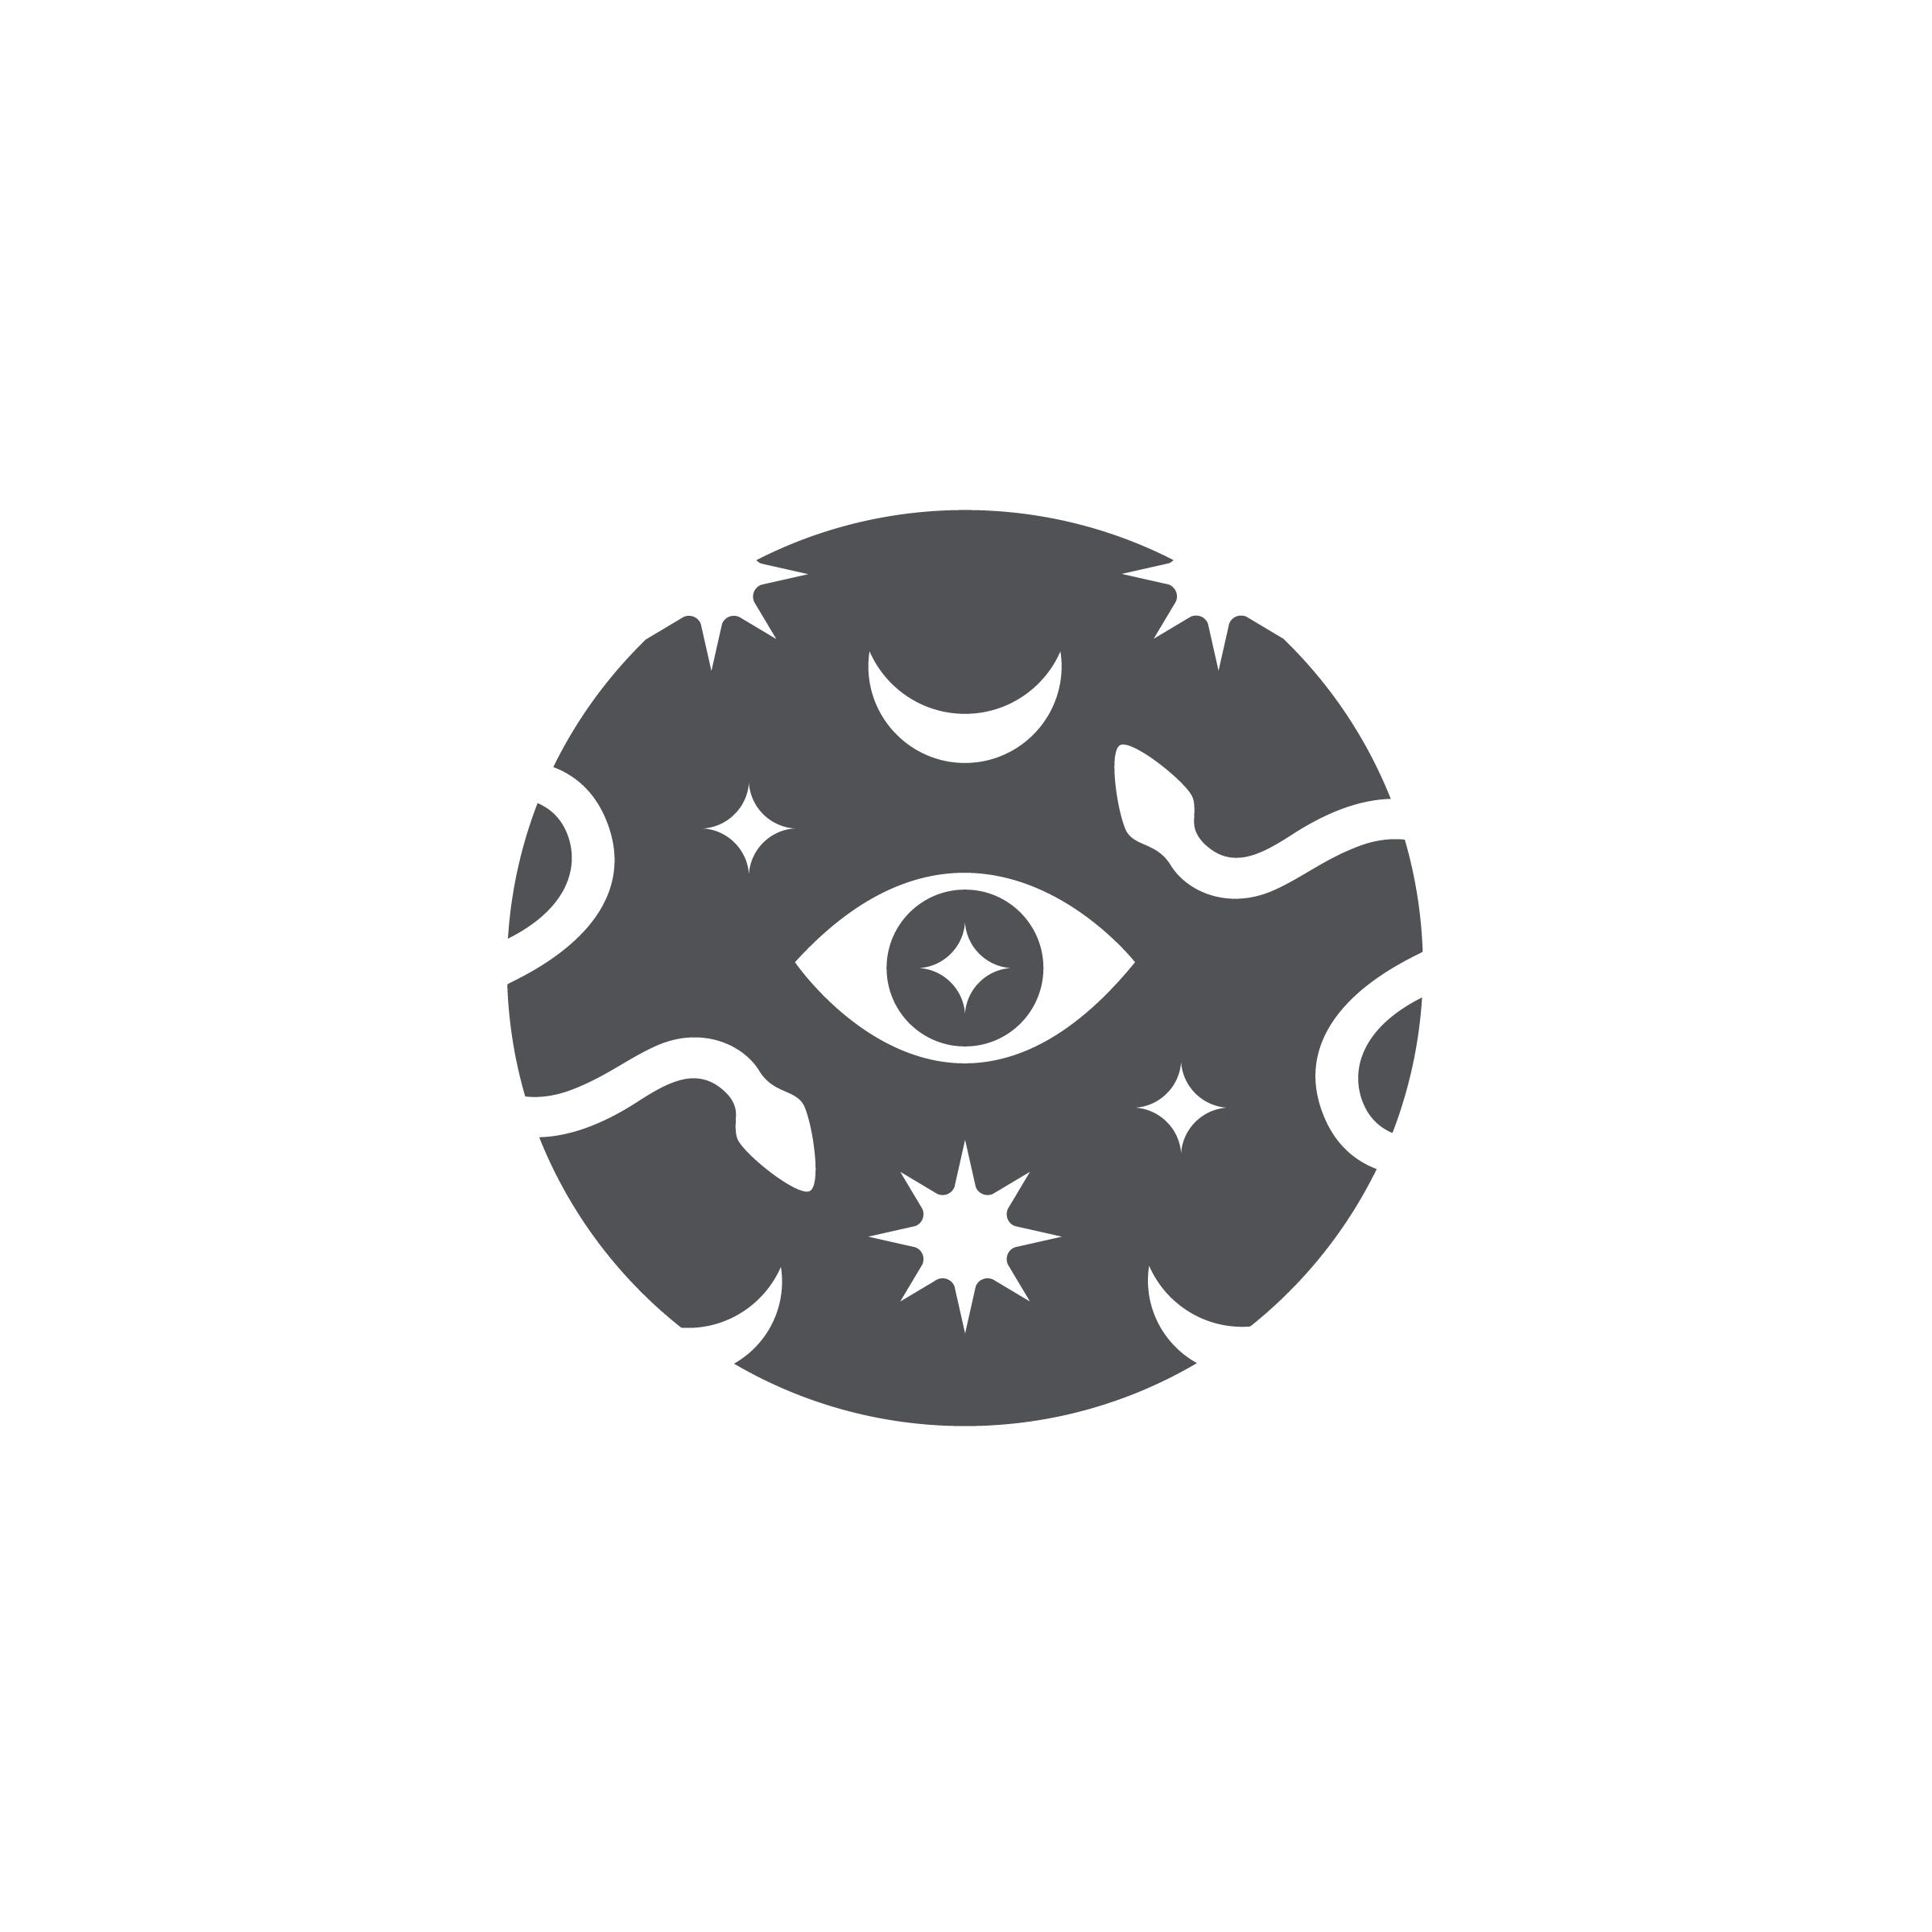 CxrcleIcon-Blackweb-01.jpg